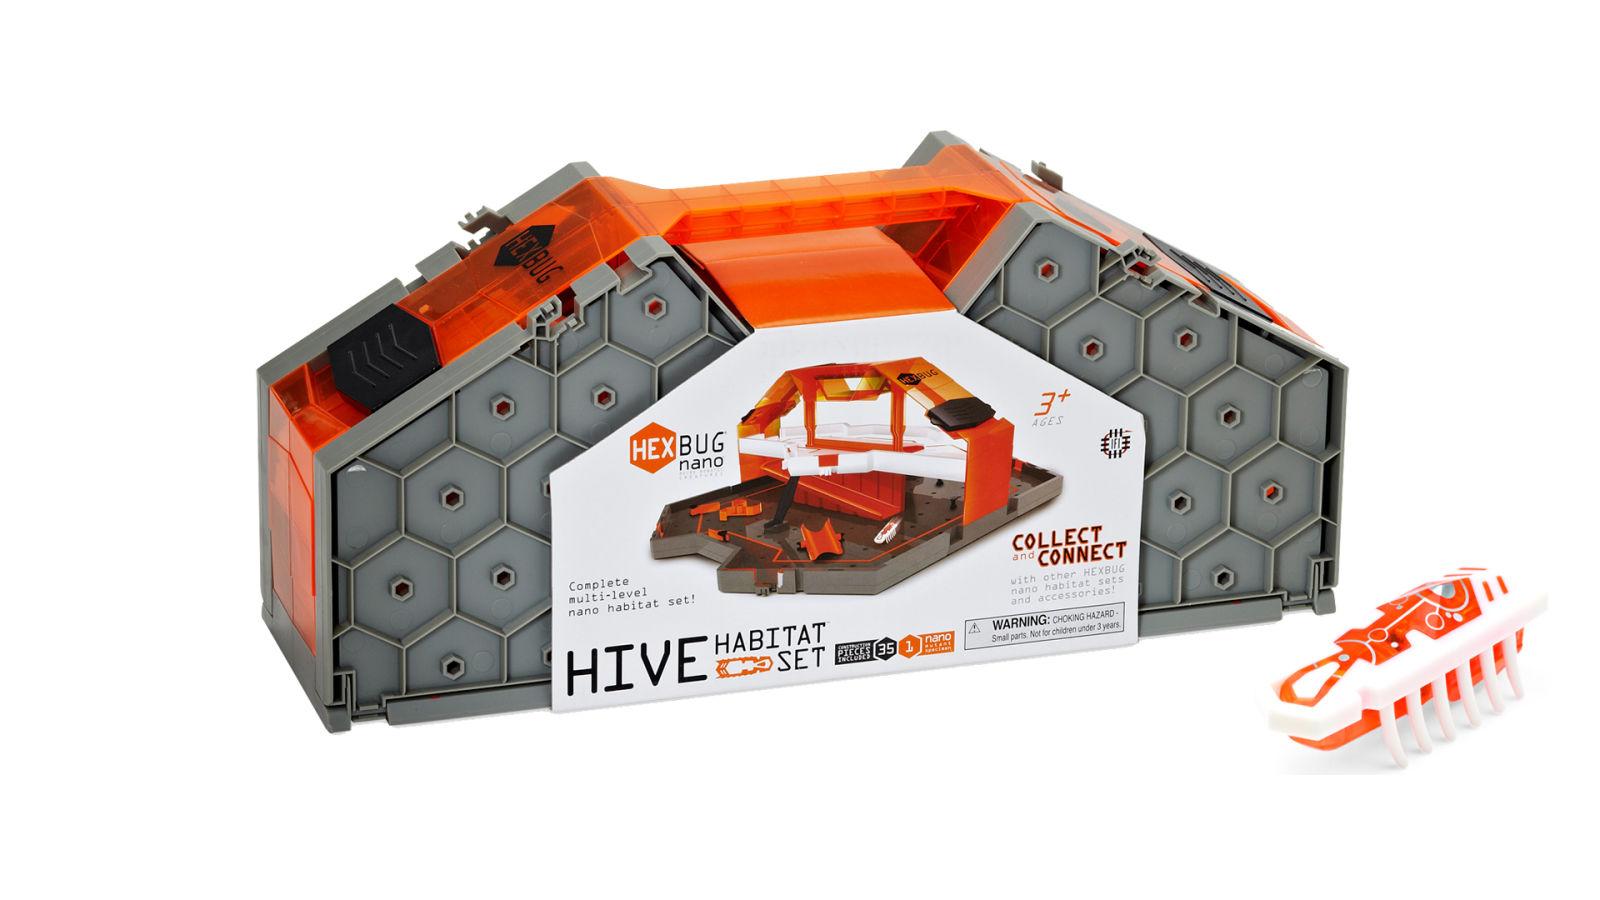 Hexbug Habitat Review Hexbug Hive Habitat Set Marko